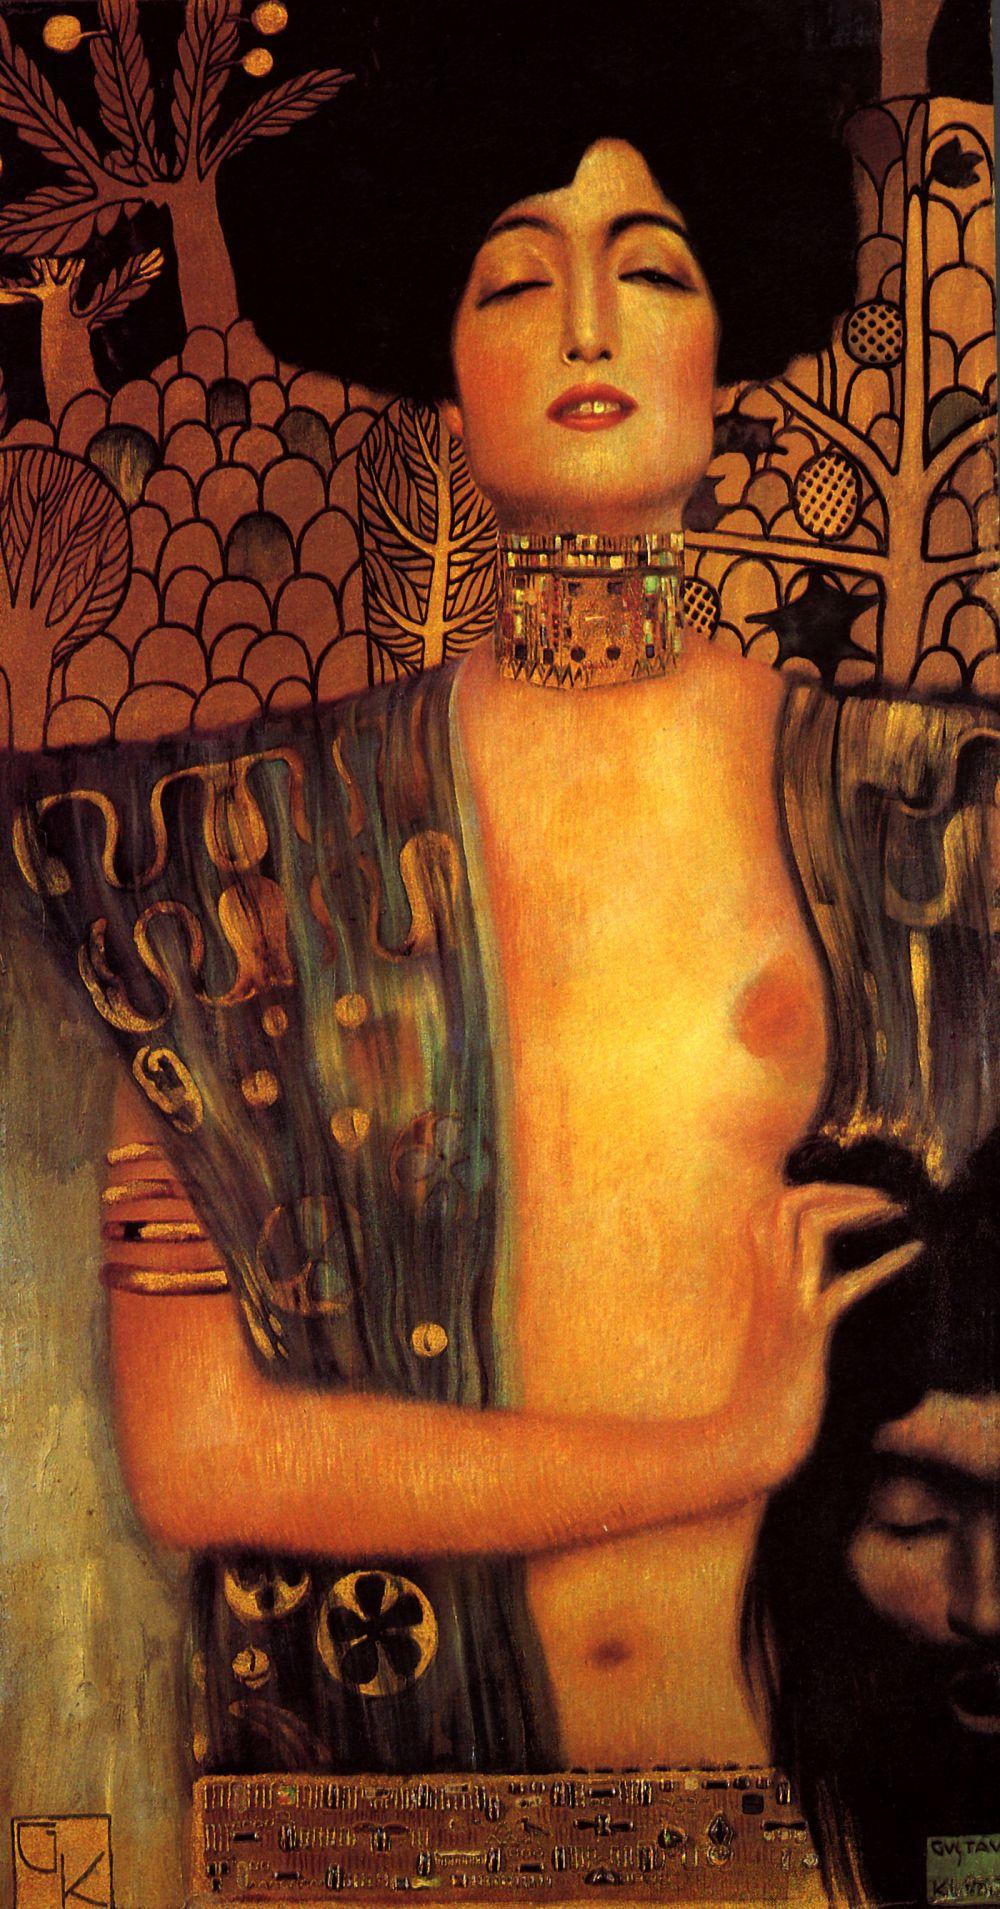 Mujeres. Mitologías Gustav Klimt,Judith and Head of Holofernes II, 19th C.